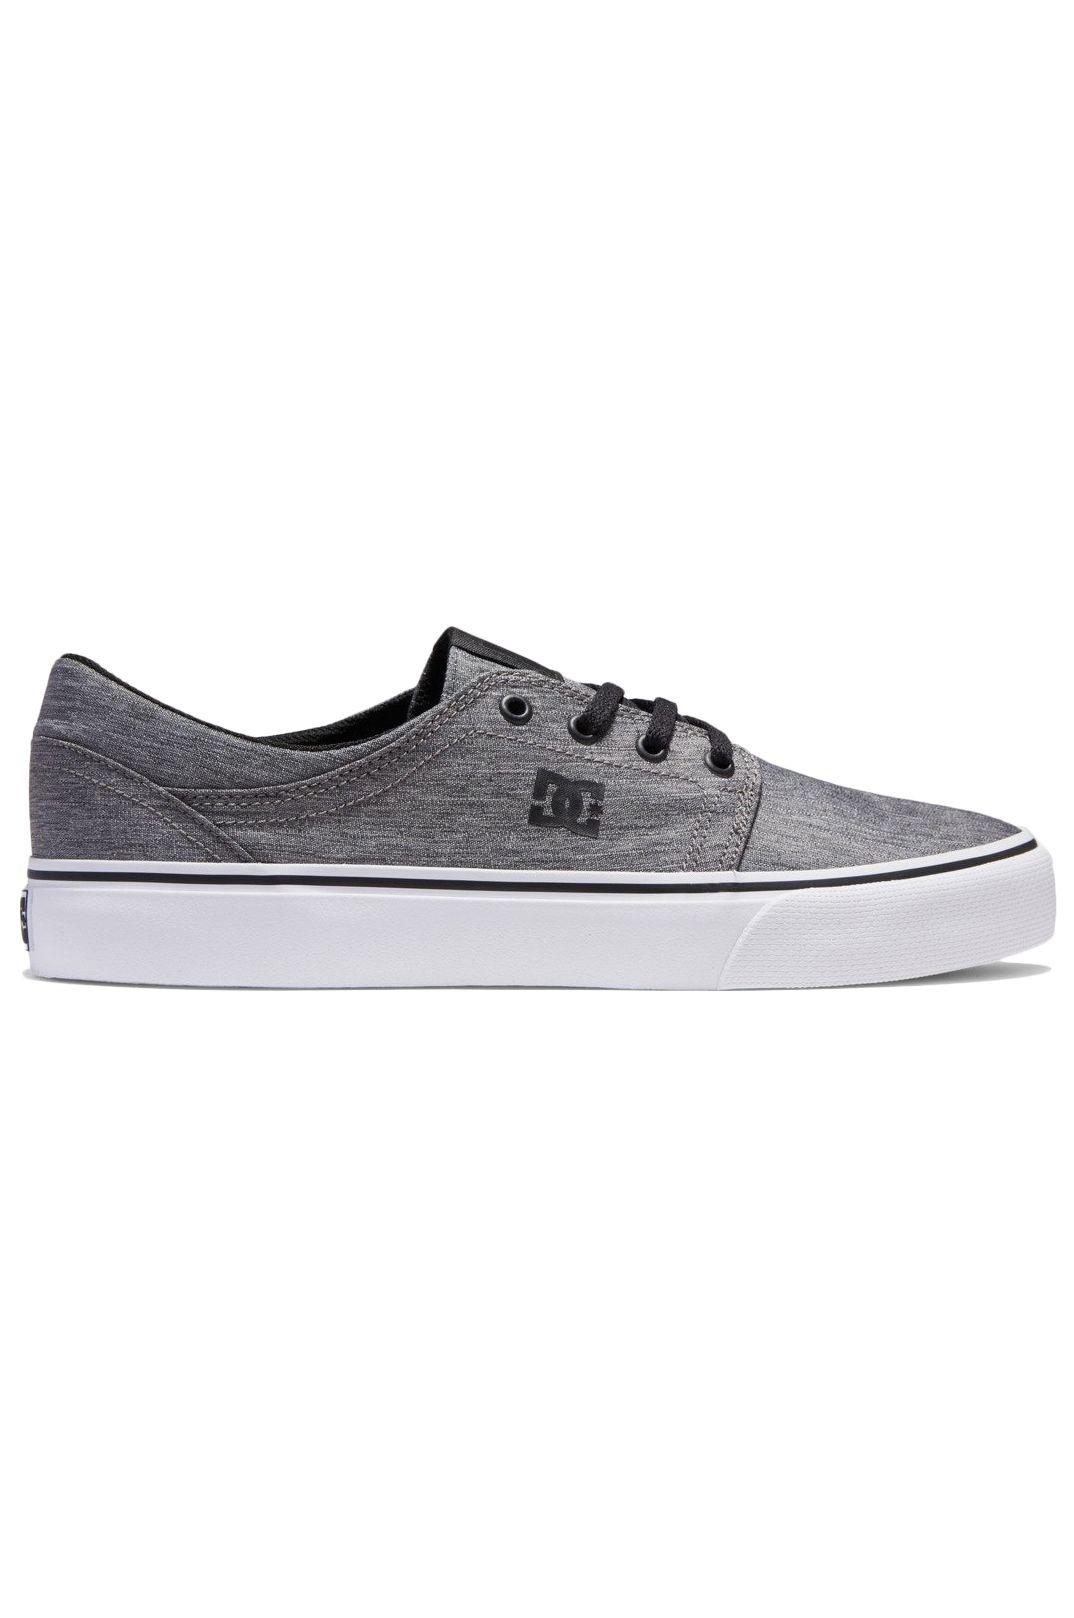 Tenis DC Shoes TRASE TX SE Black/Heather Grey